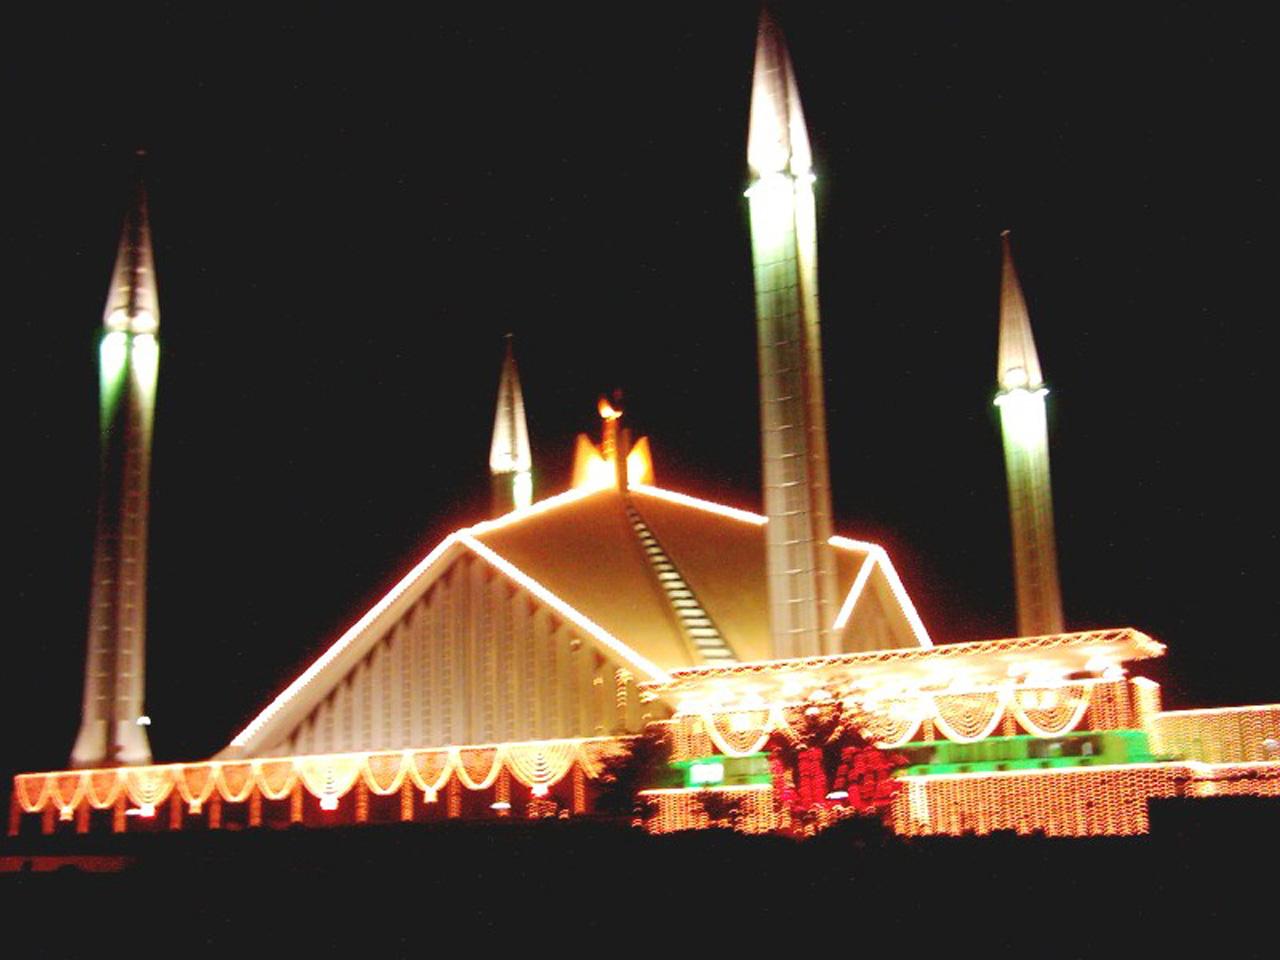 http://2.bp.blogspot.com/-57L2ubWBOHY/TidA0RJv7KI/AAAAAAAAAMs/azu0vEjnqcY/s1600/faisal_mosque_wallpaper.jpg